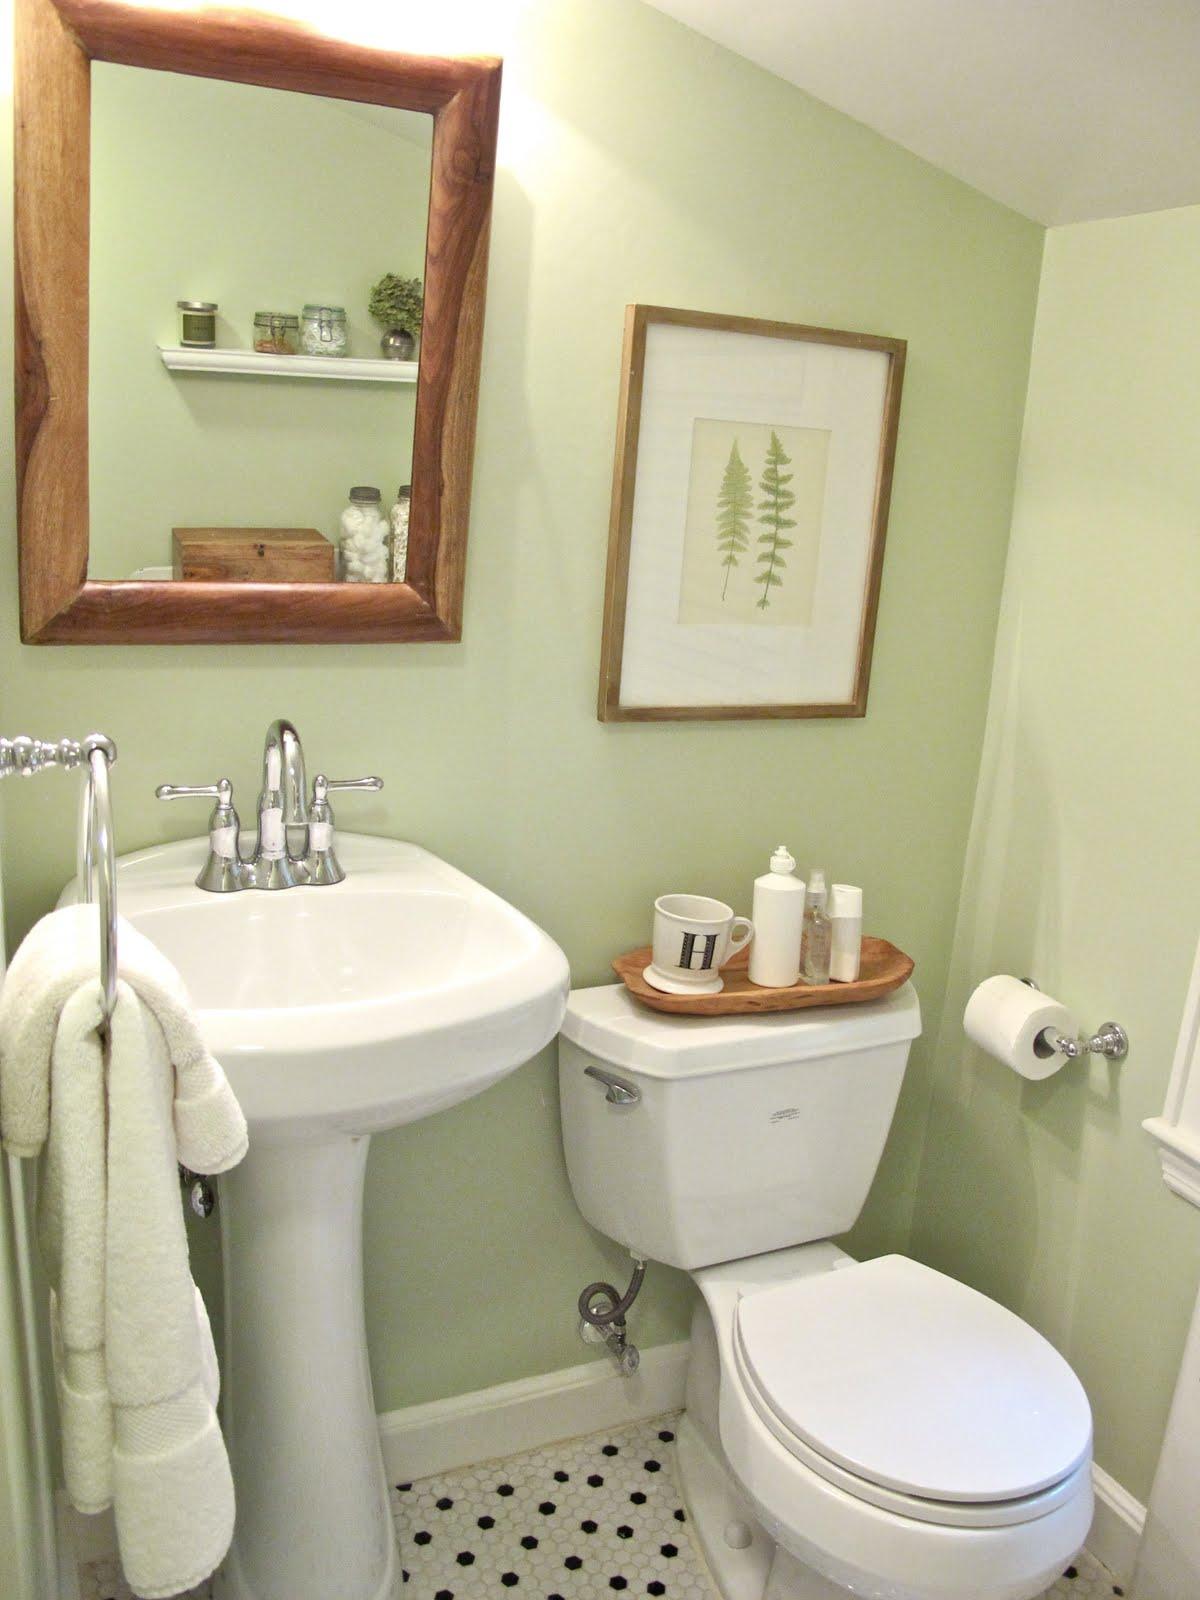 Bathroom Redo | Pinterest Challenge | Inspiration For Adding Storage To A  Small Bathroom